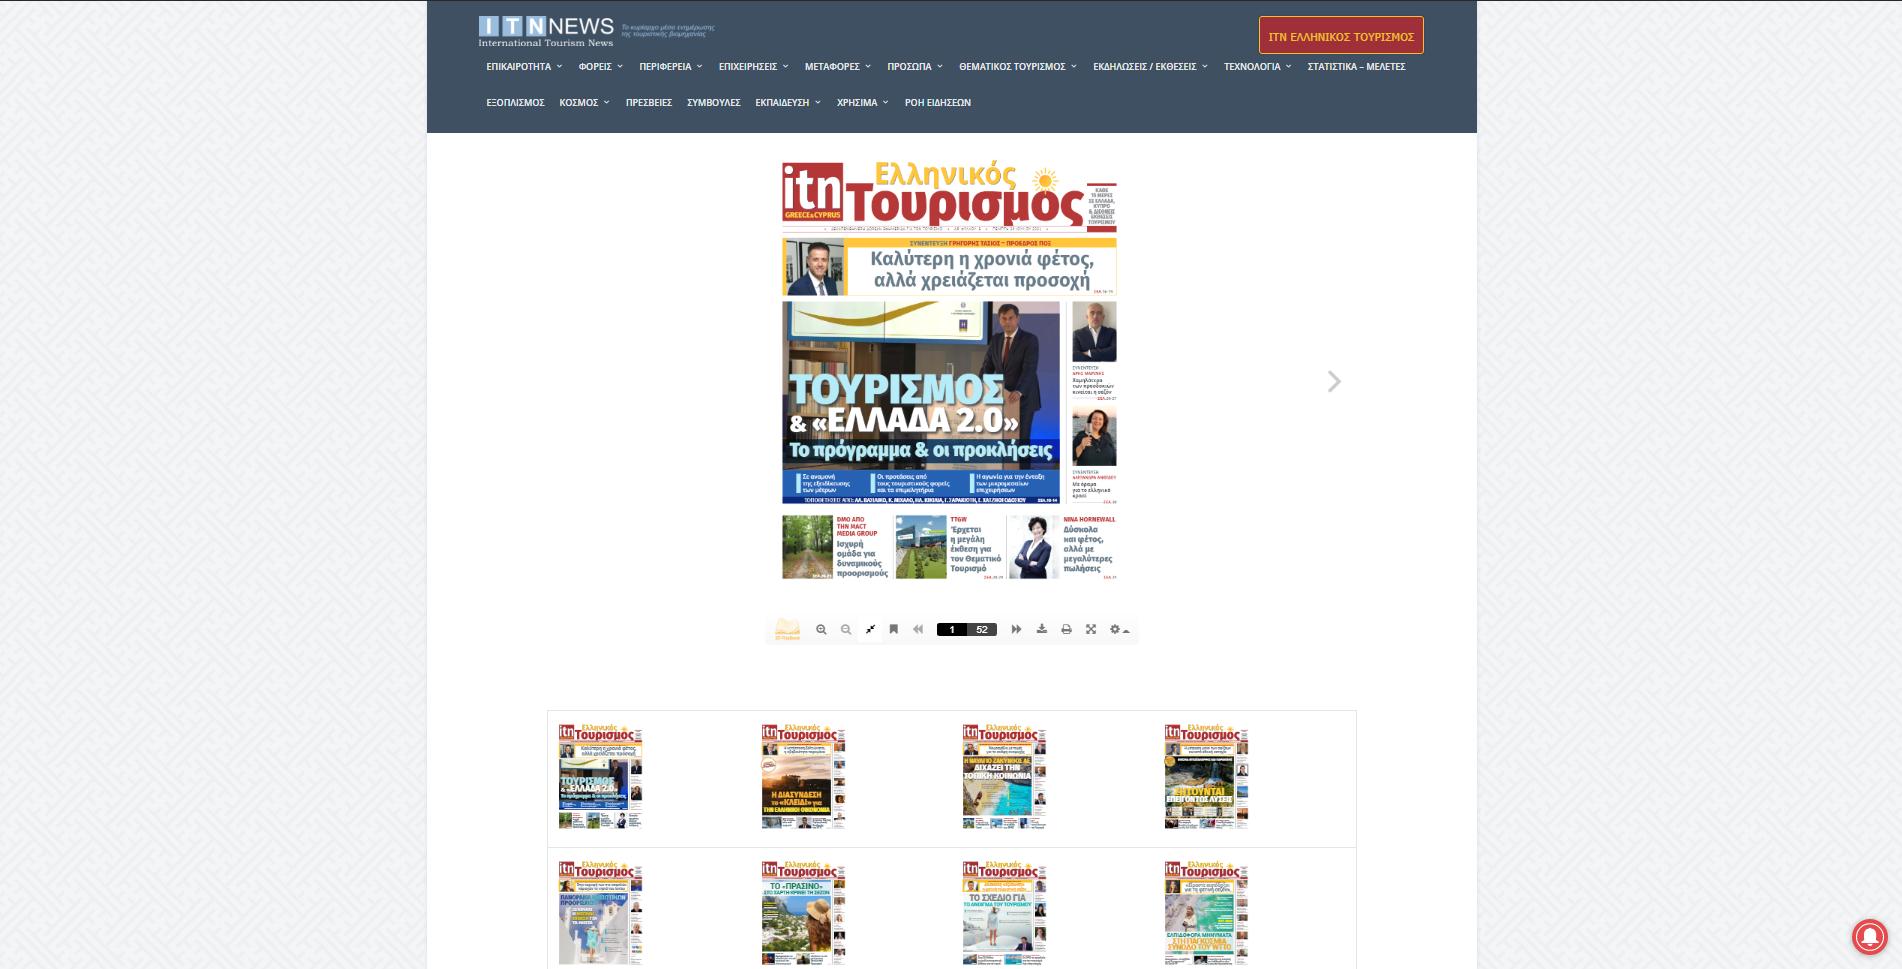 https://mact.gr/wp-content/uploads/2021/08/itn_tourism.png